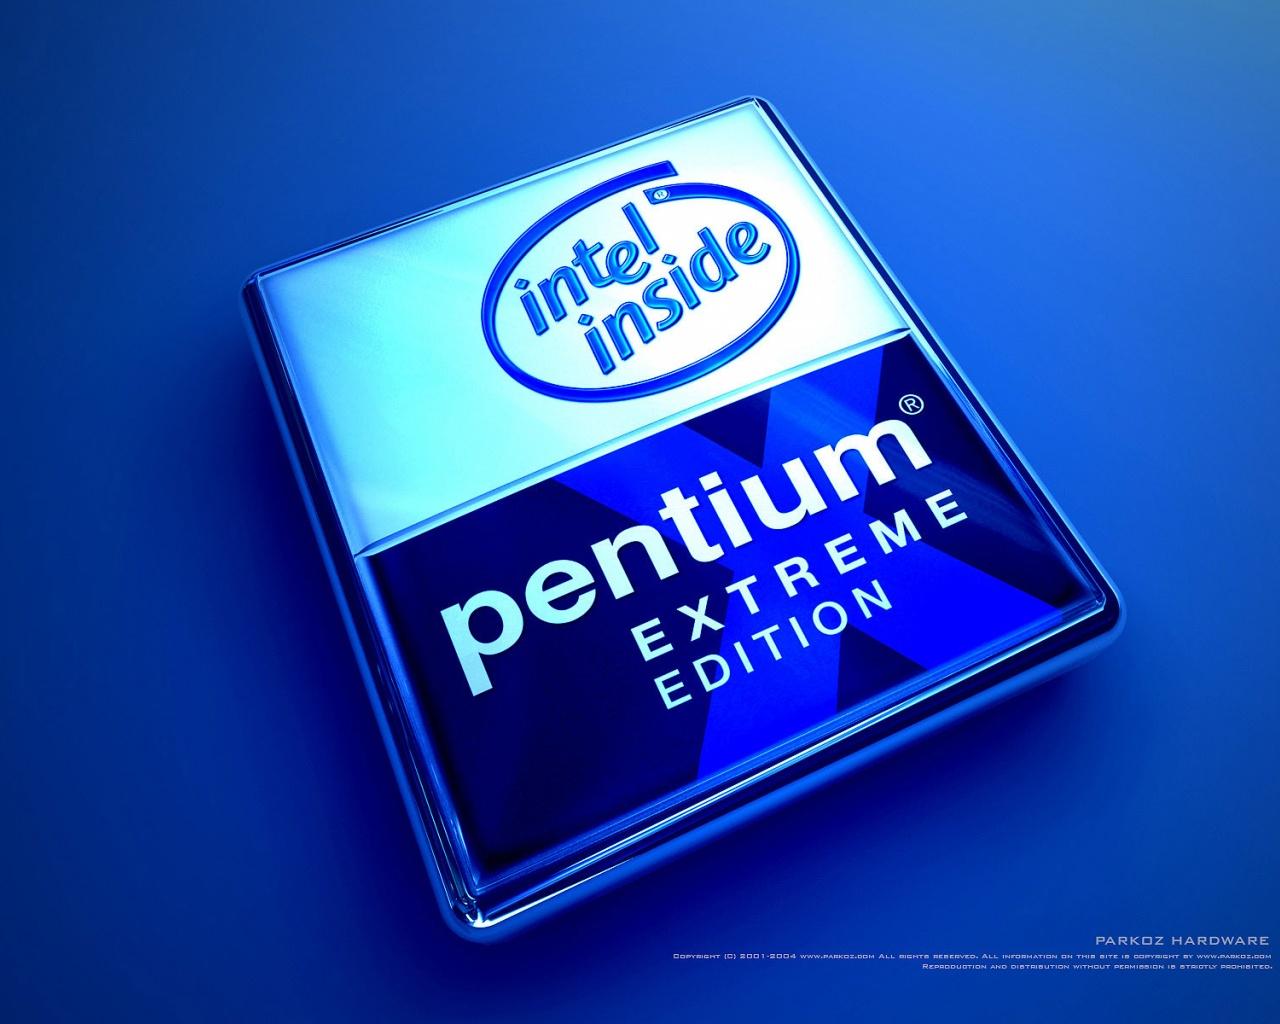 1280x1024 Blue Pentium desktop PC and Mac wallpaper 1280x1024